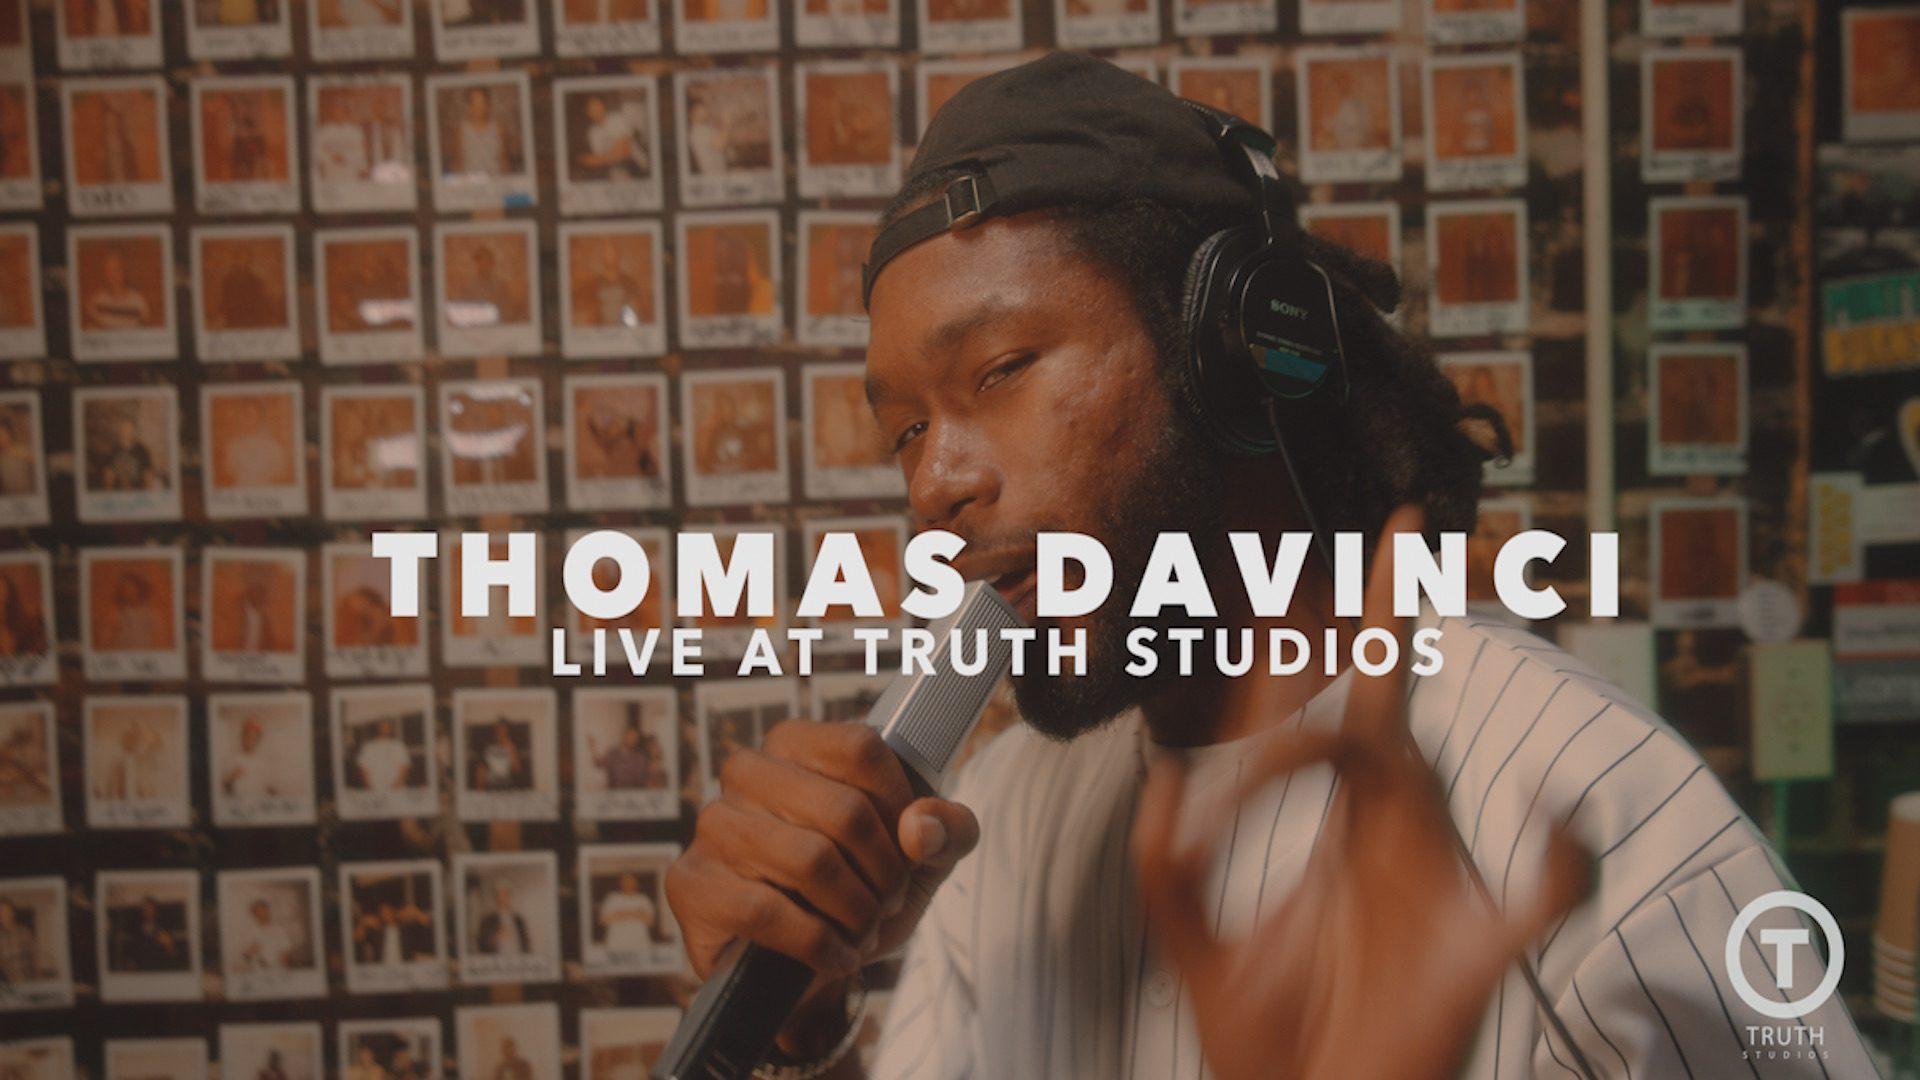 Thomas DaVinci - Imagine (Live at Truth Studio)